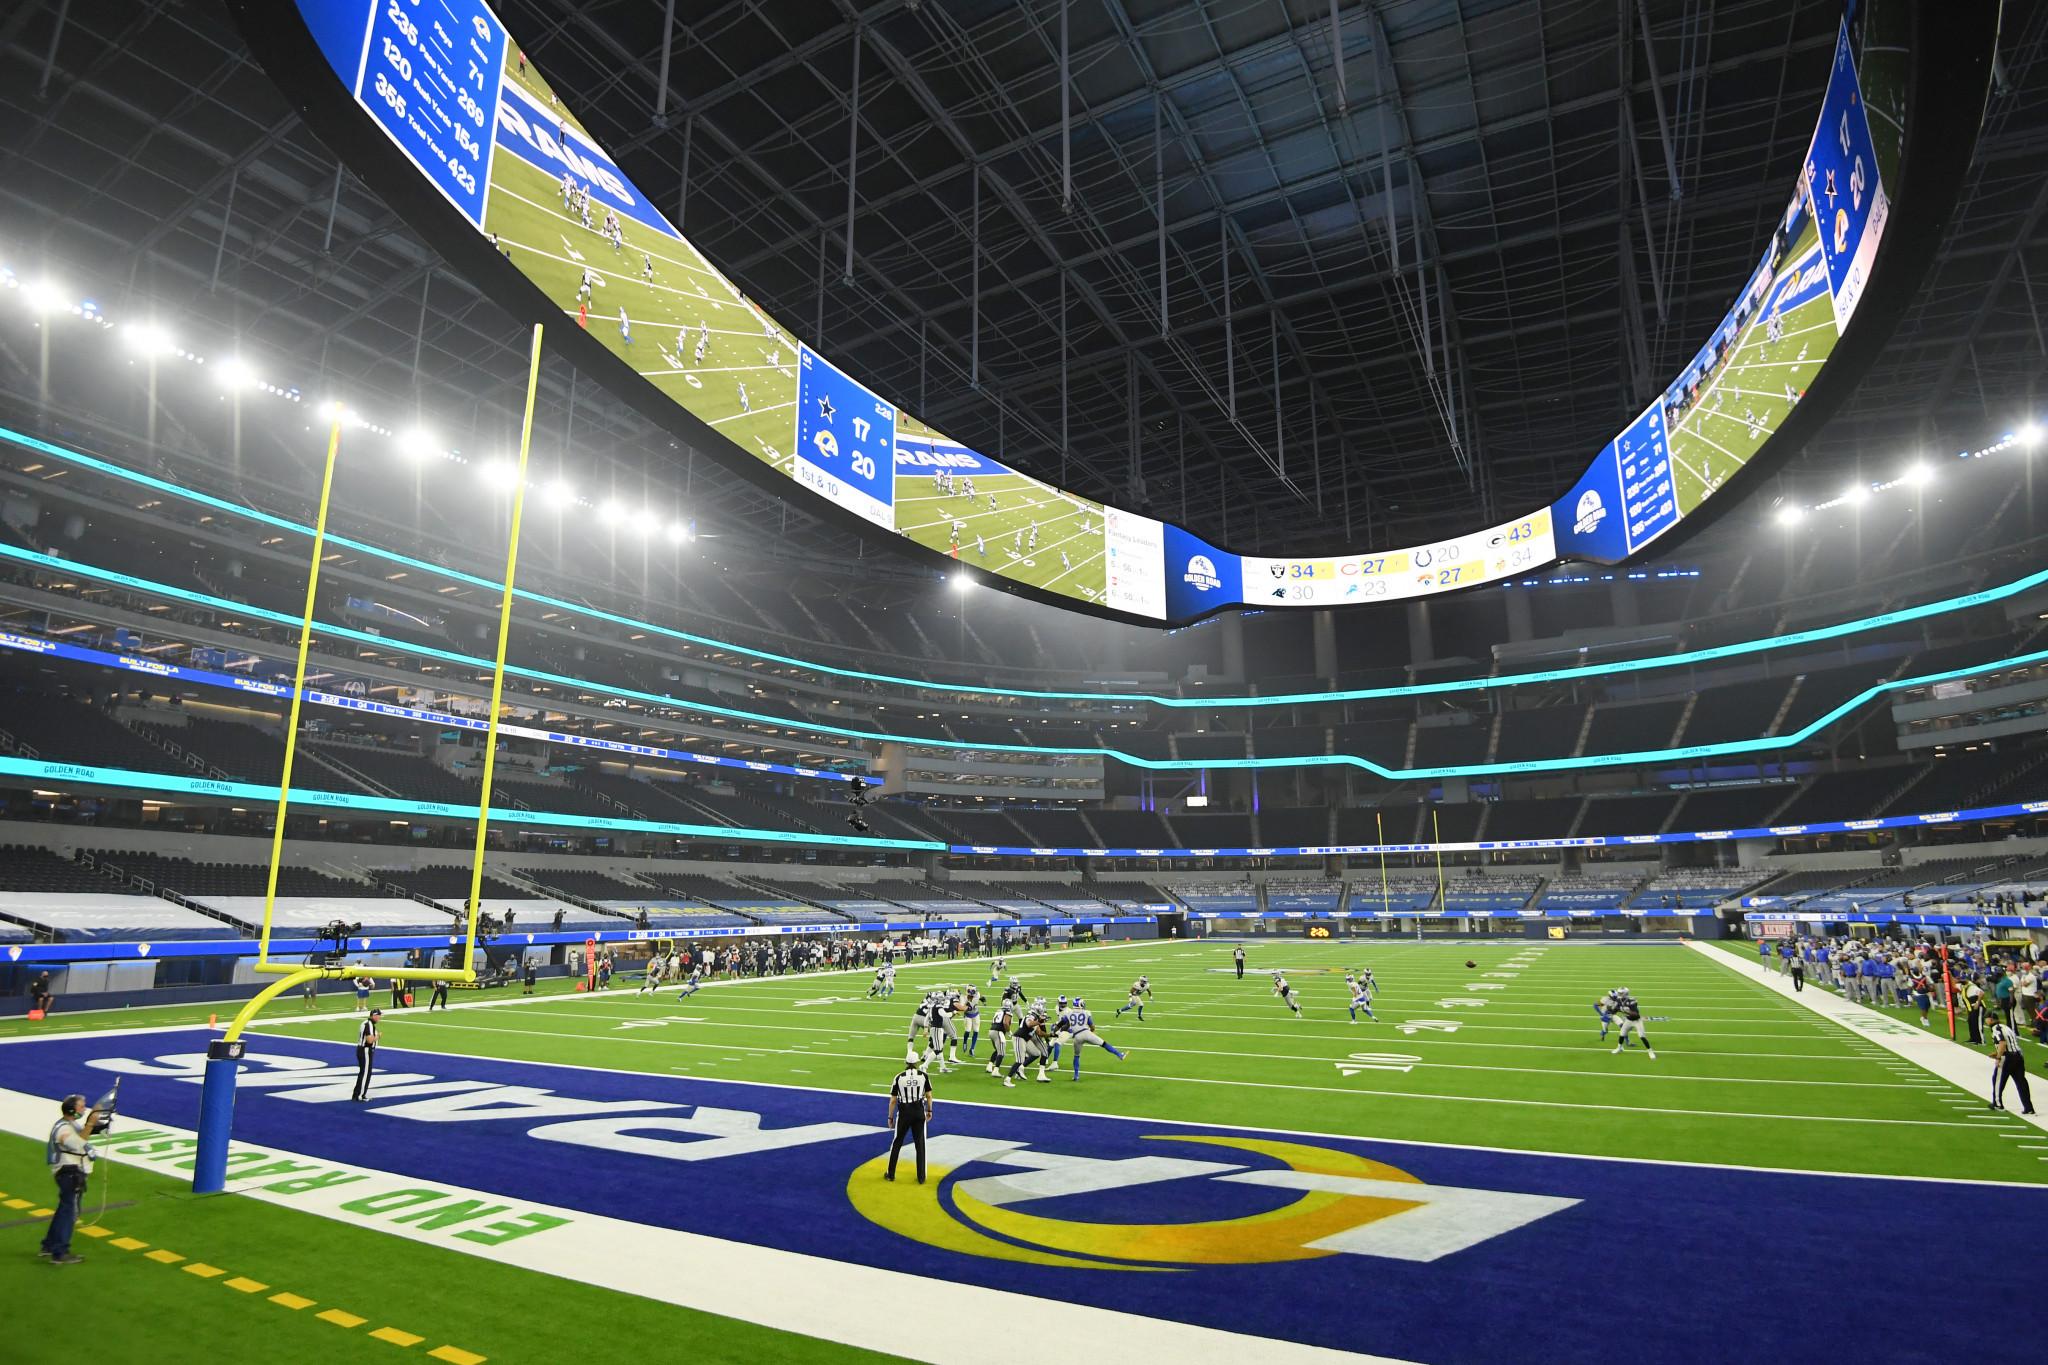 "Los Angeles 2028 venue curtain-raiser takes place in  ""eerie"" atmosphere"